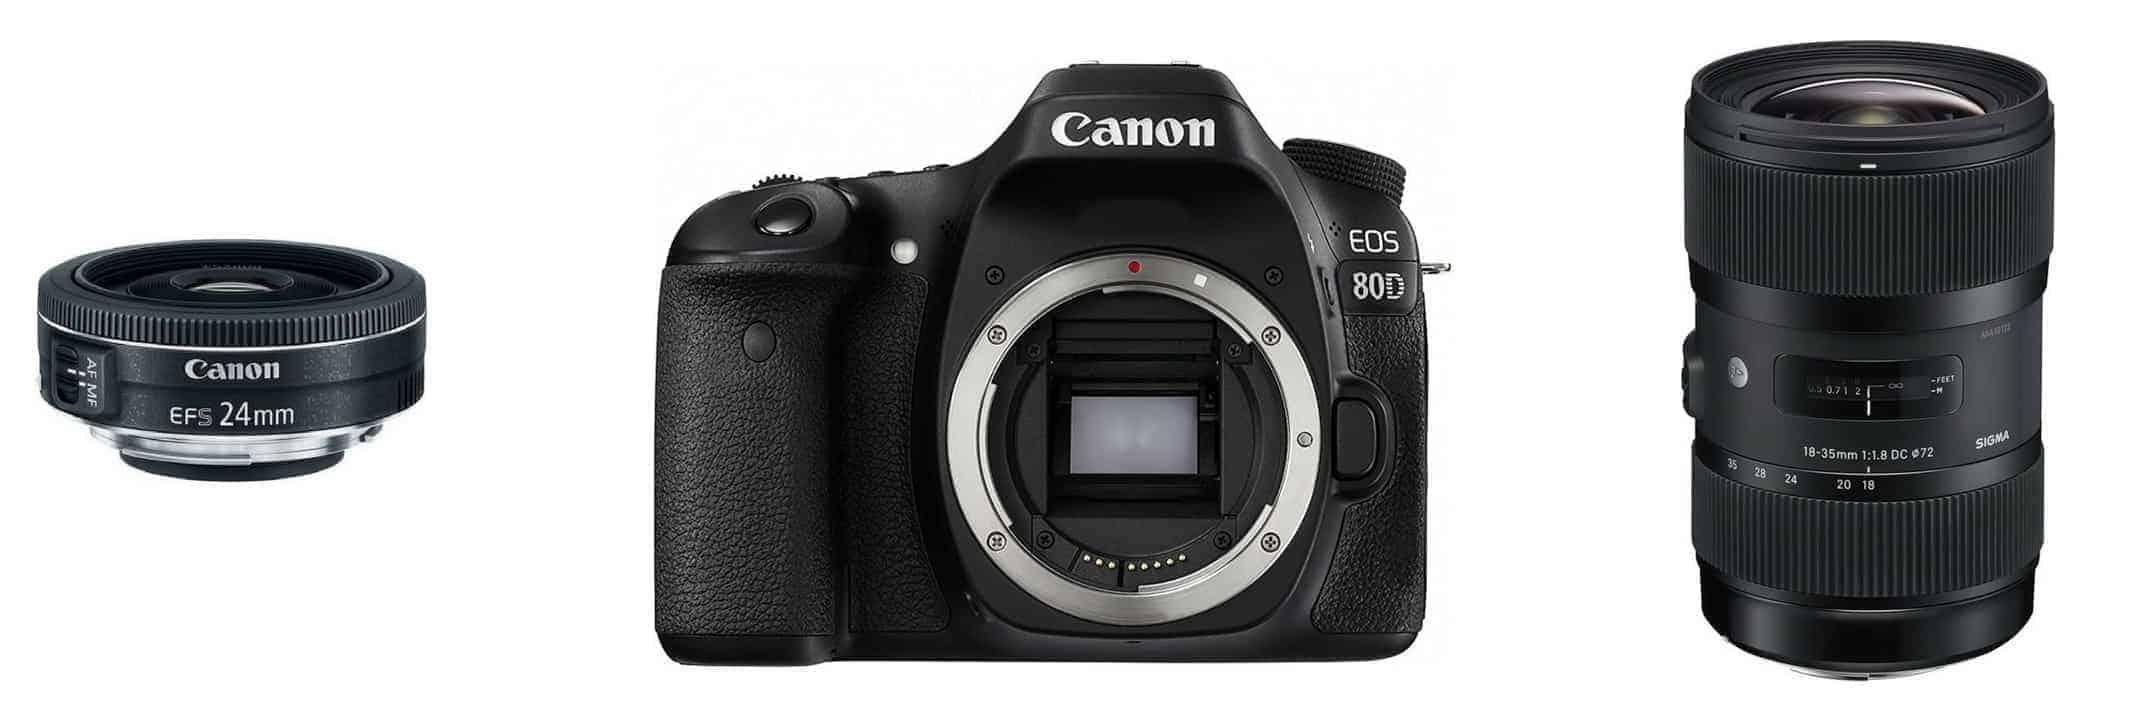 Best Canon 80D Lenses